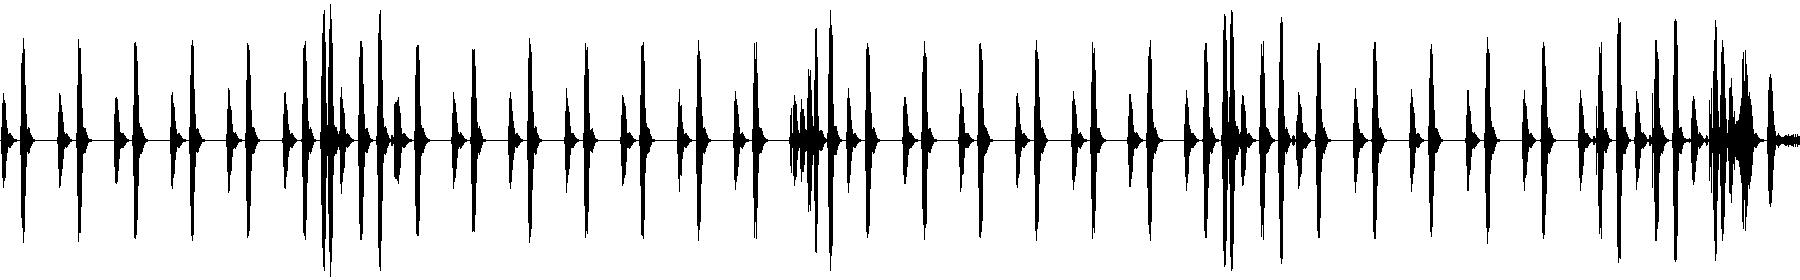 monophonic alzheimer2 128